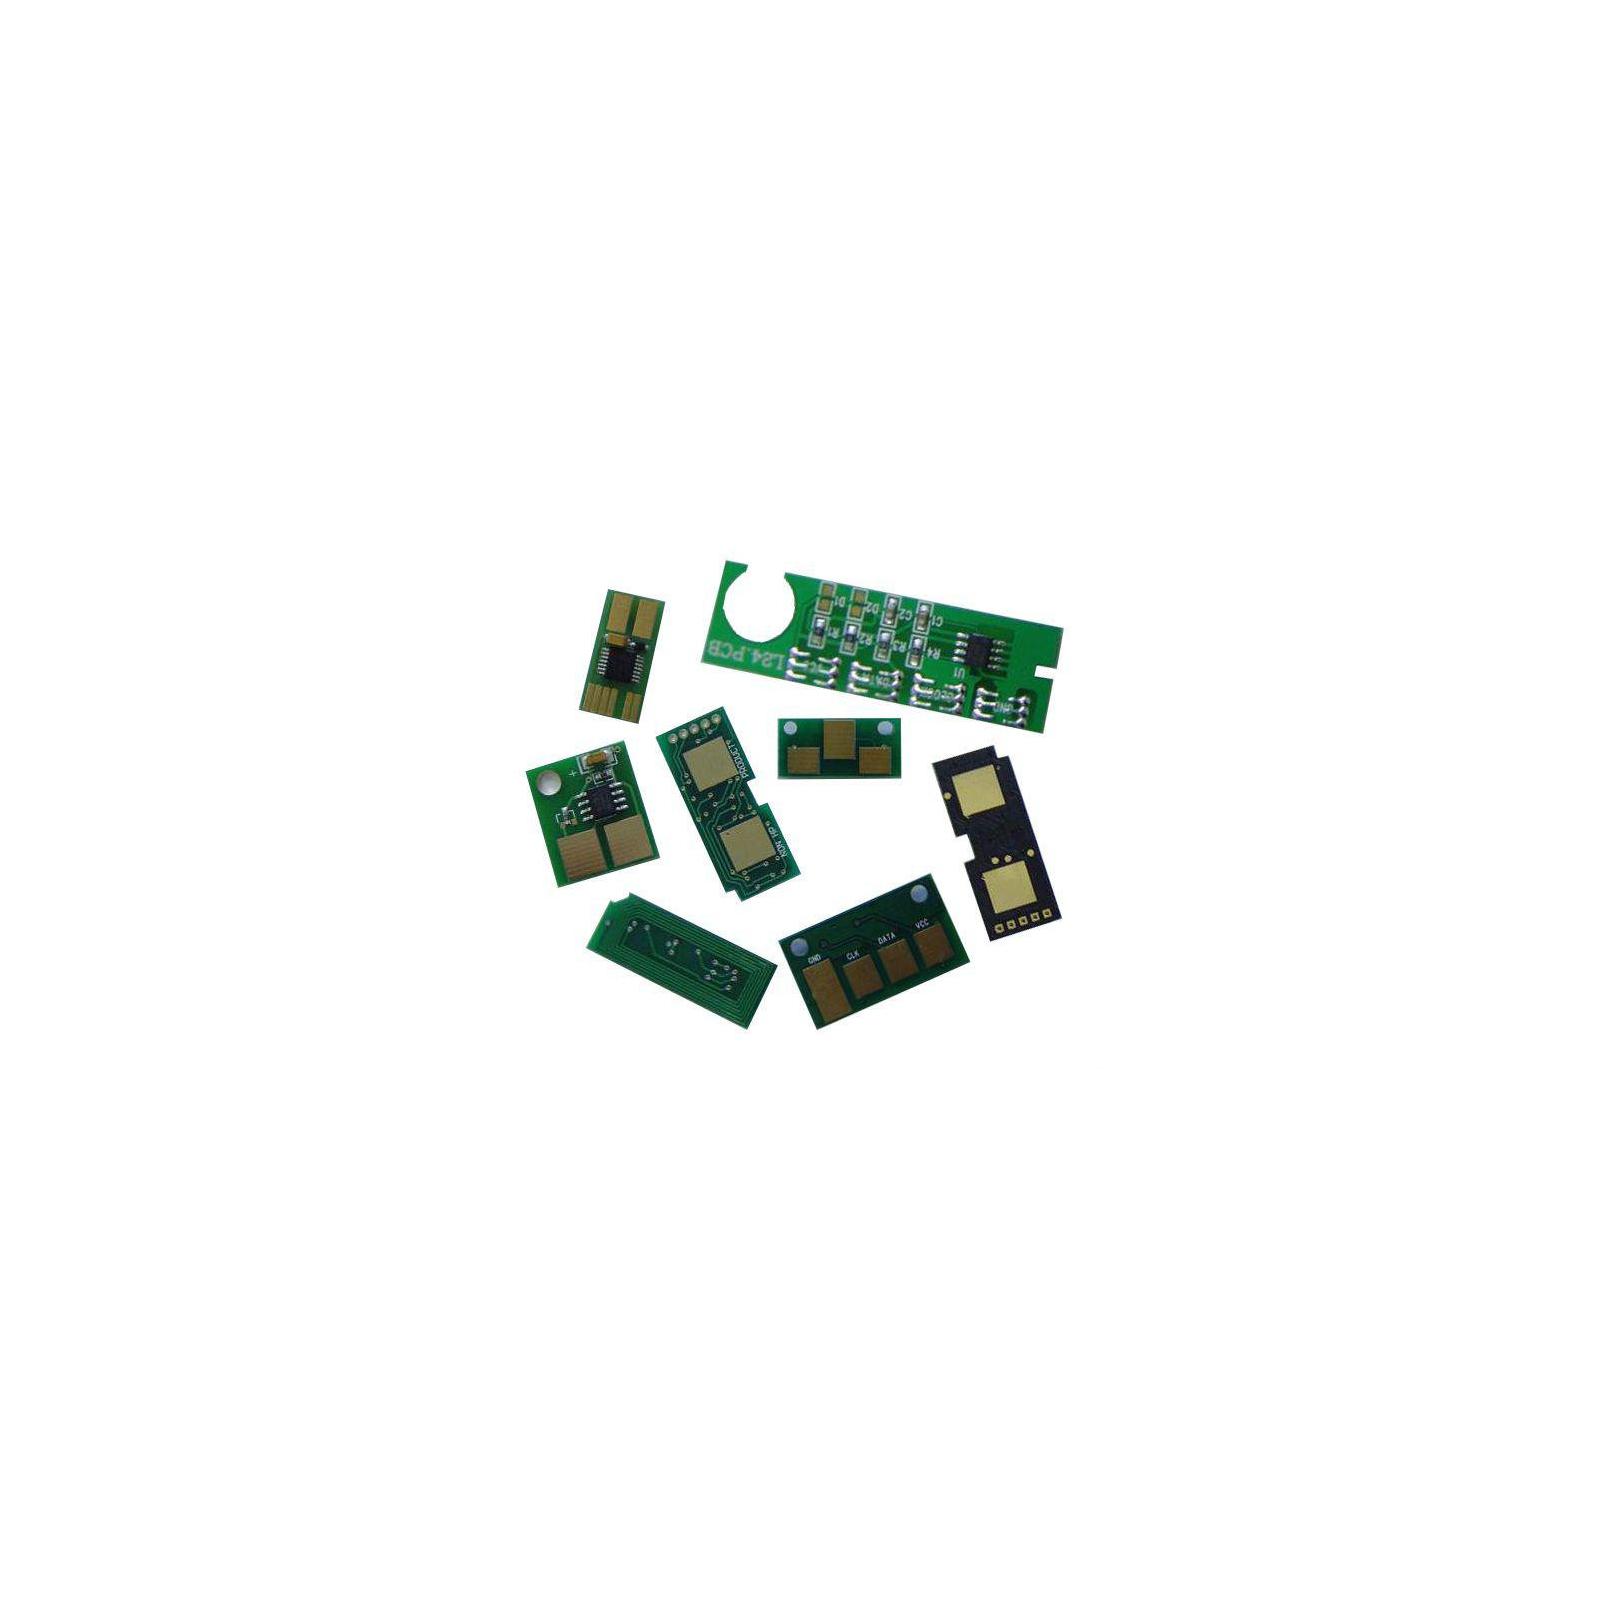 Чип для картриджа CANON 039 ДЛЯ LBP351/352 11K Everprint (CHIP-CAN-039)